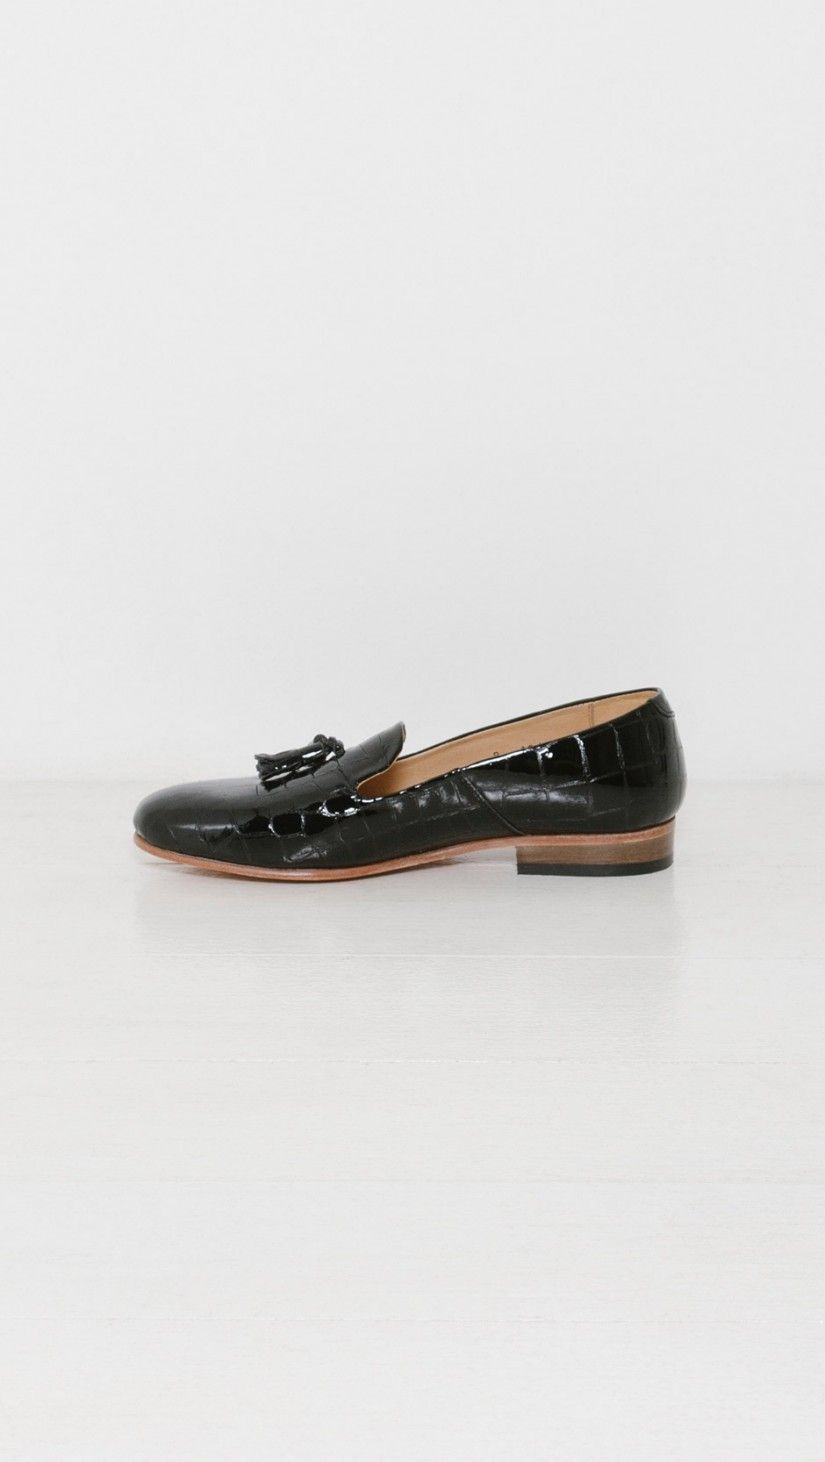 Dieppa Restrepo Woman Gaston Leather Loafers Purple Size 7 Dieppa Restrepo zNkyBE